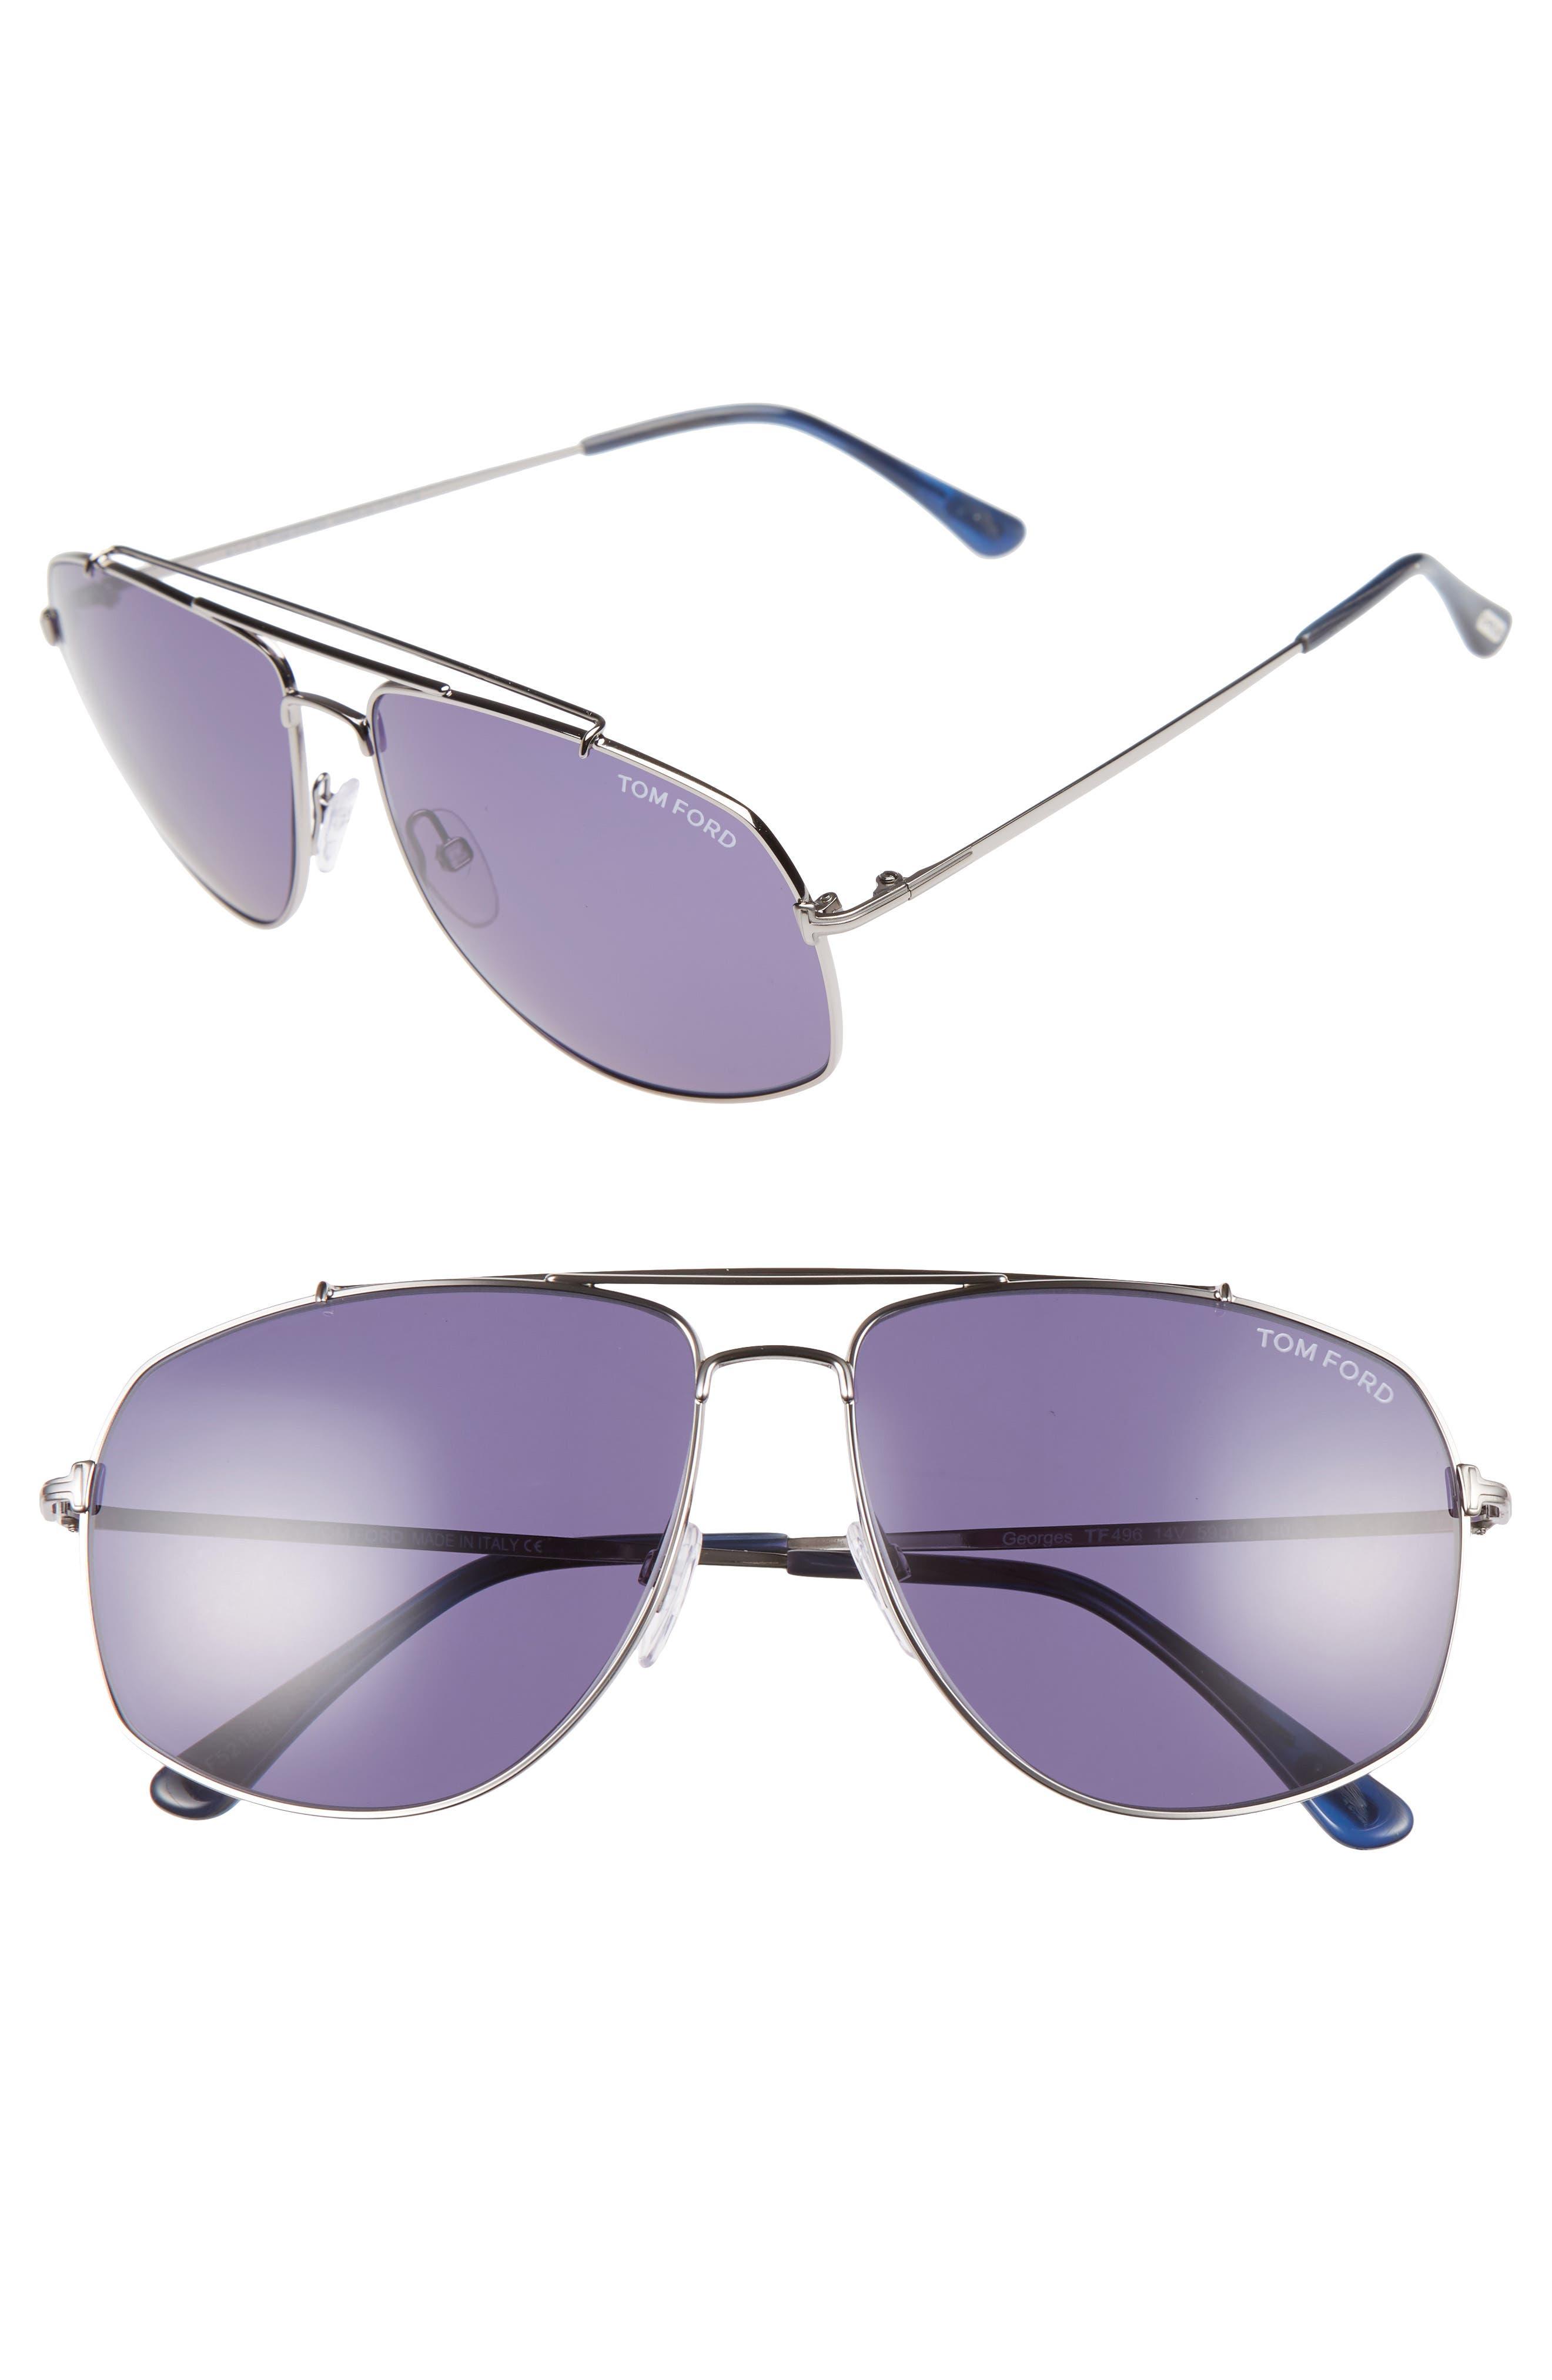 59mm Aviator Sunglasses,                         Main,                         color, Silver/ Blue